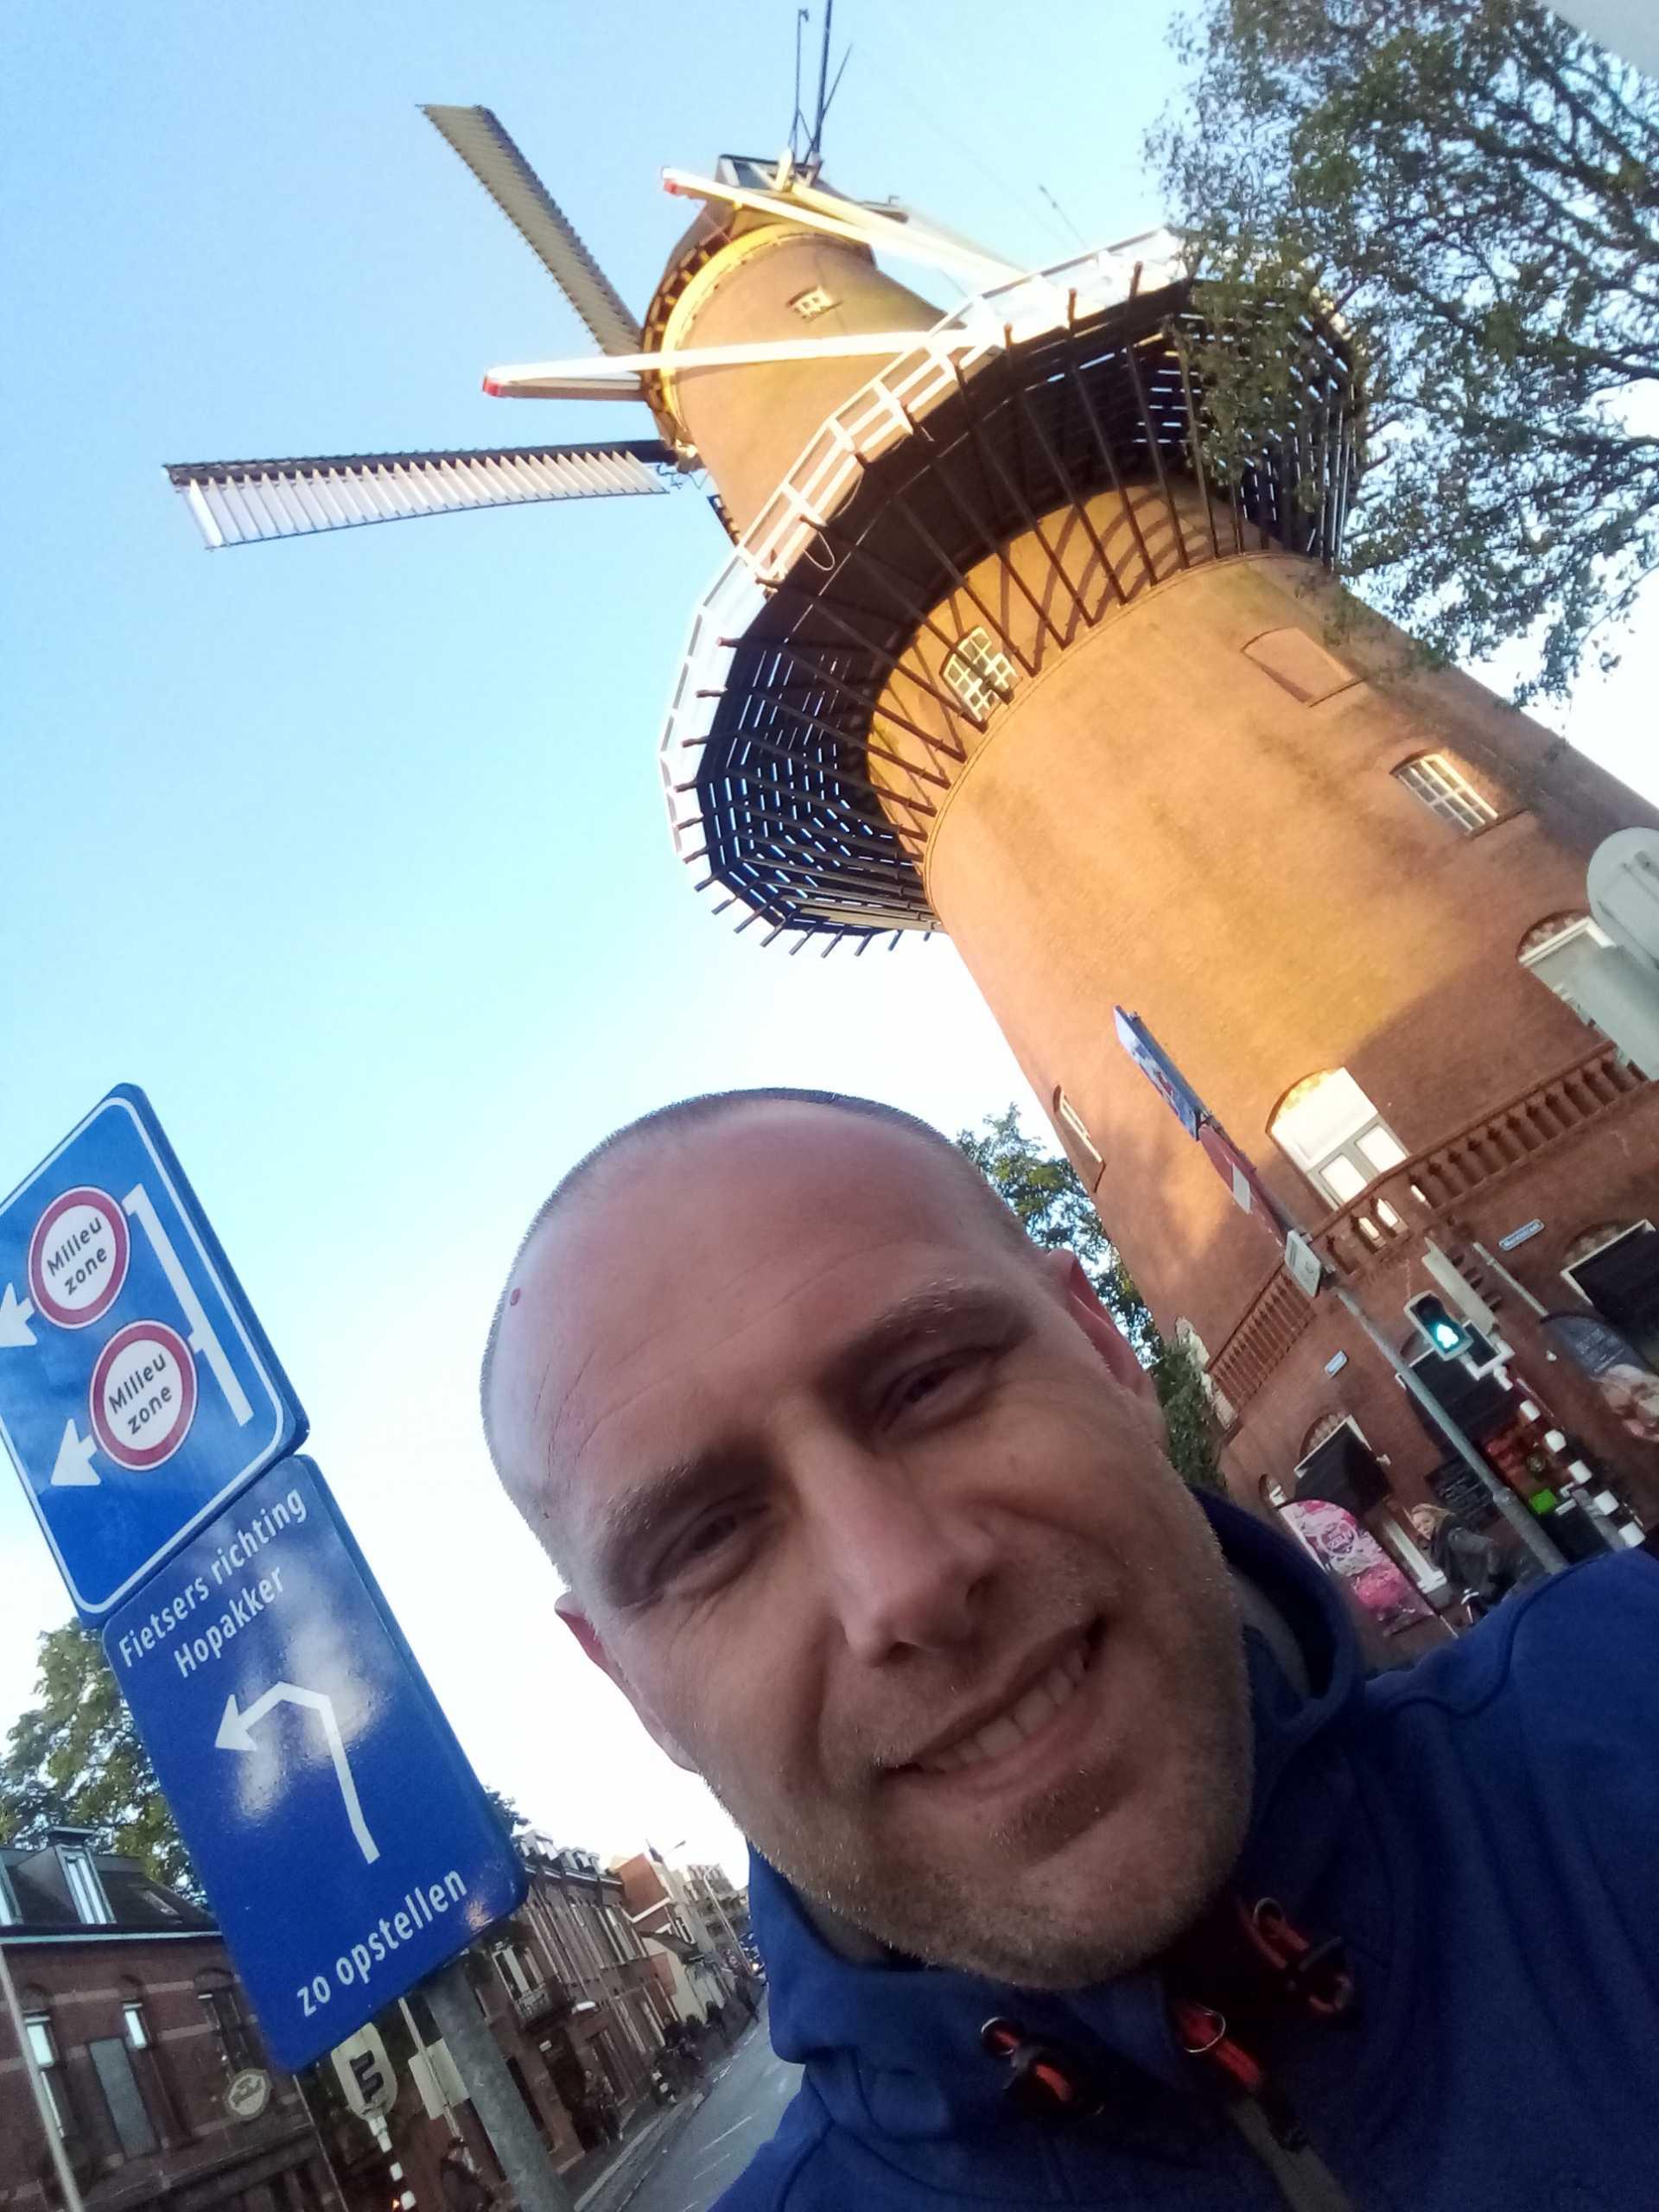 Molen Utrecht - FamilieNieuws.com